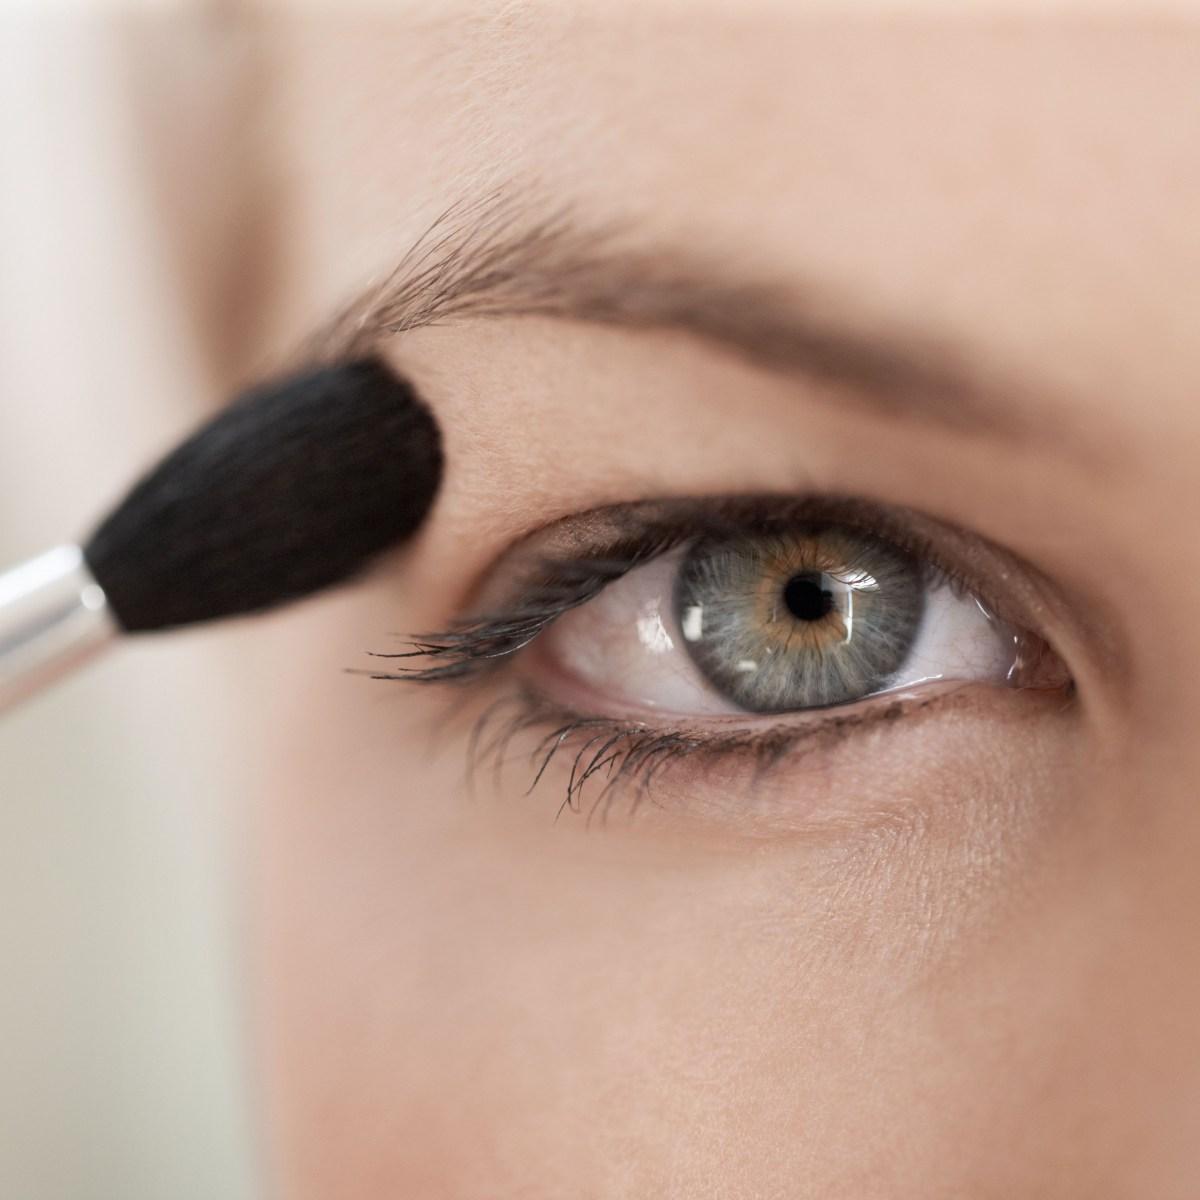 Hooded Eyes Makeup Makeup Tricks For Hooded Eyes Hooded Eyes Makeup Tips And Tricks